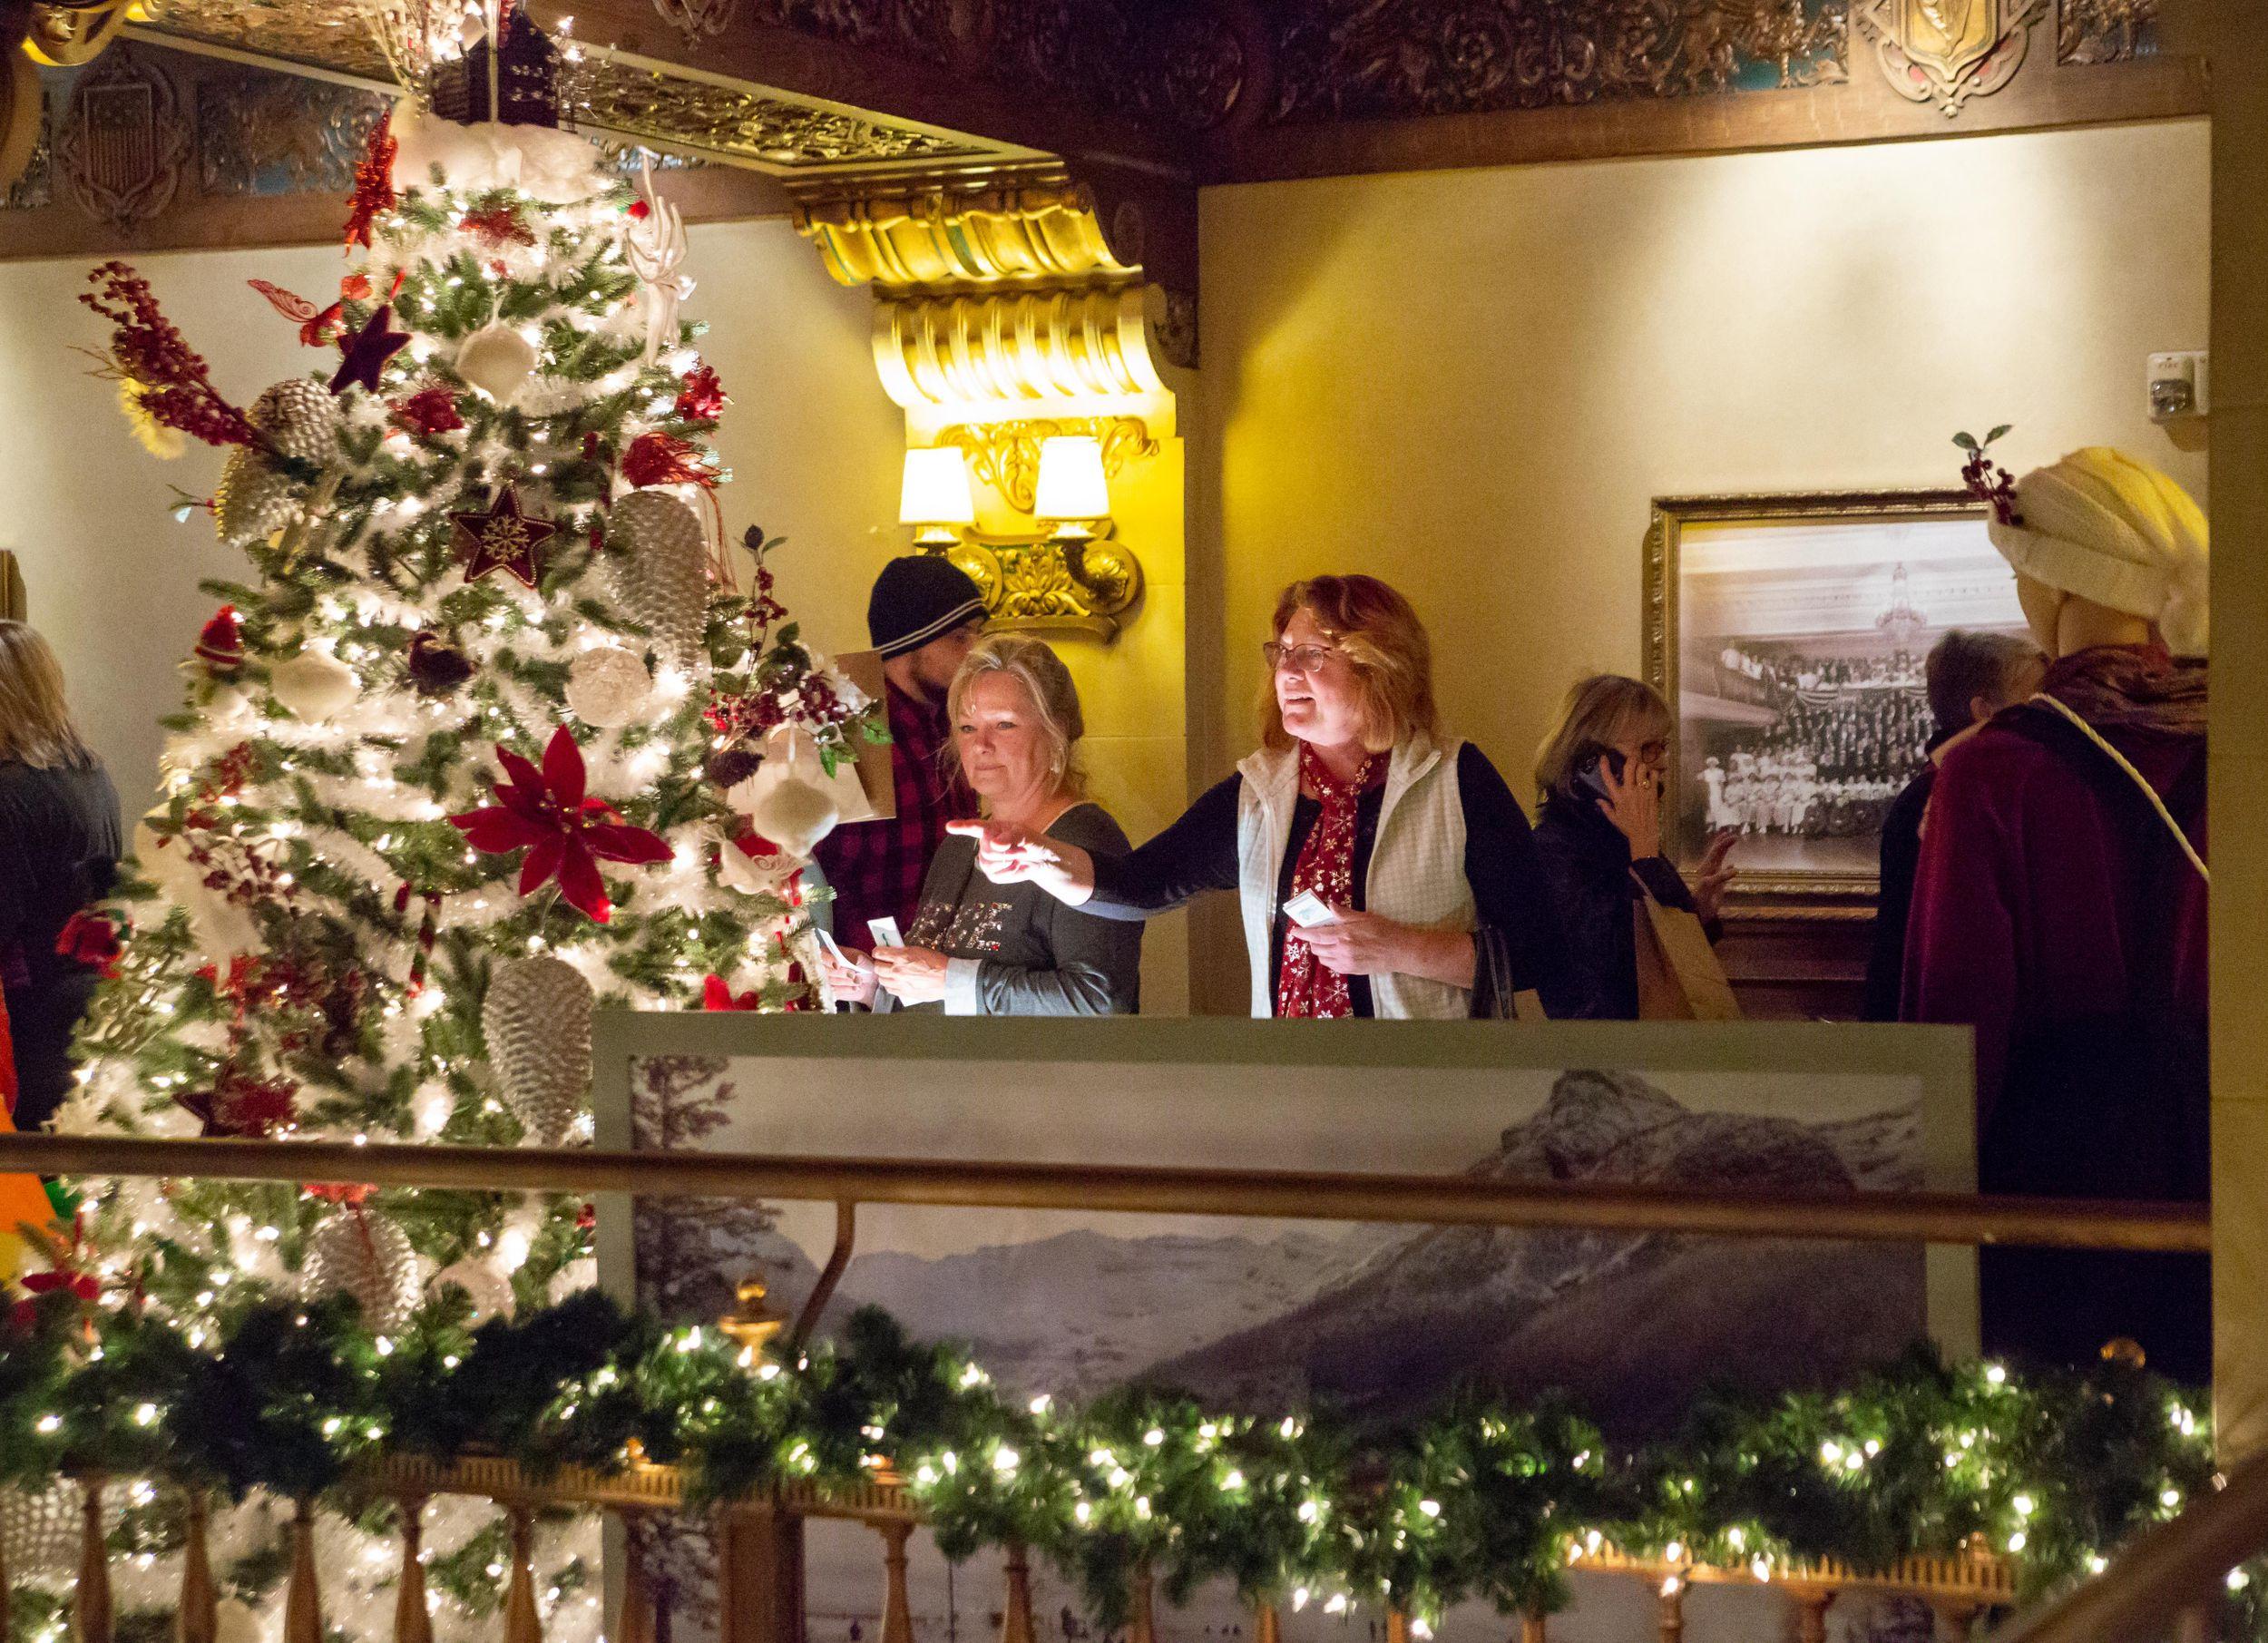 Davenport Hotel Christmas Tree Elegance 2021 Christmas Tree Elegance Raises Money For Spokane Symphony The Spokesman Review